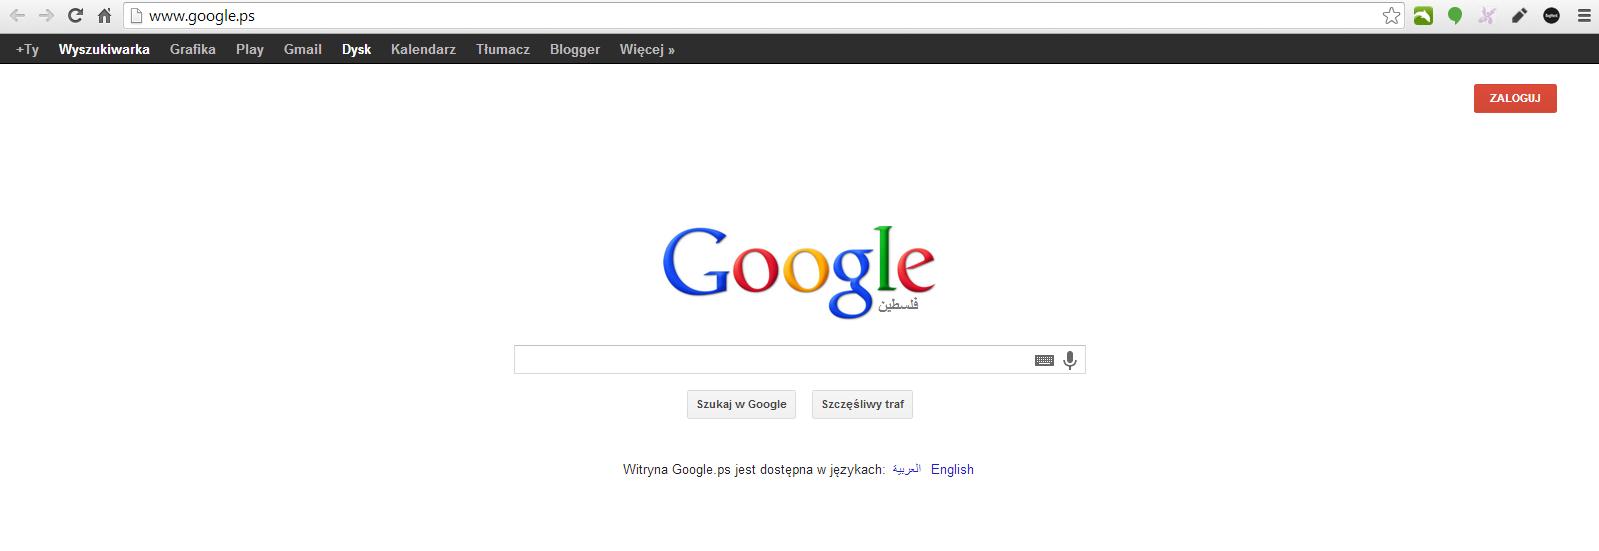 googleps